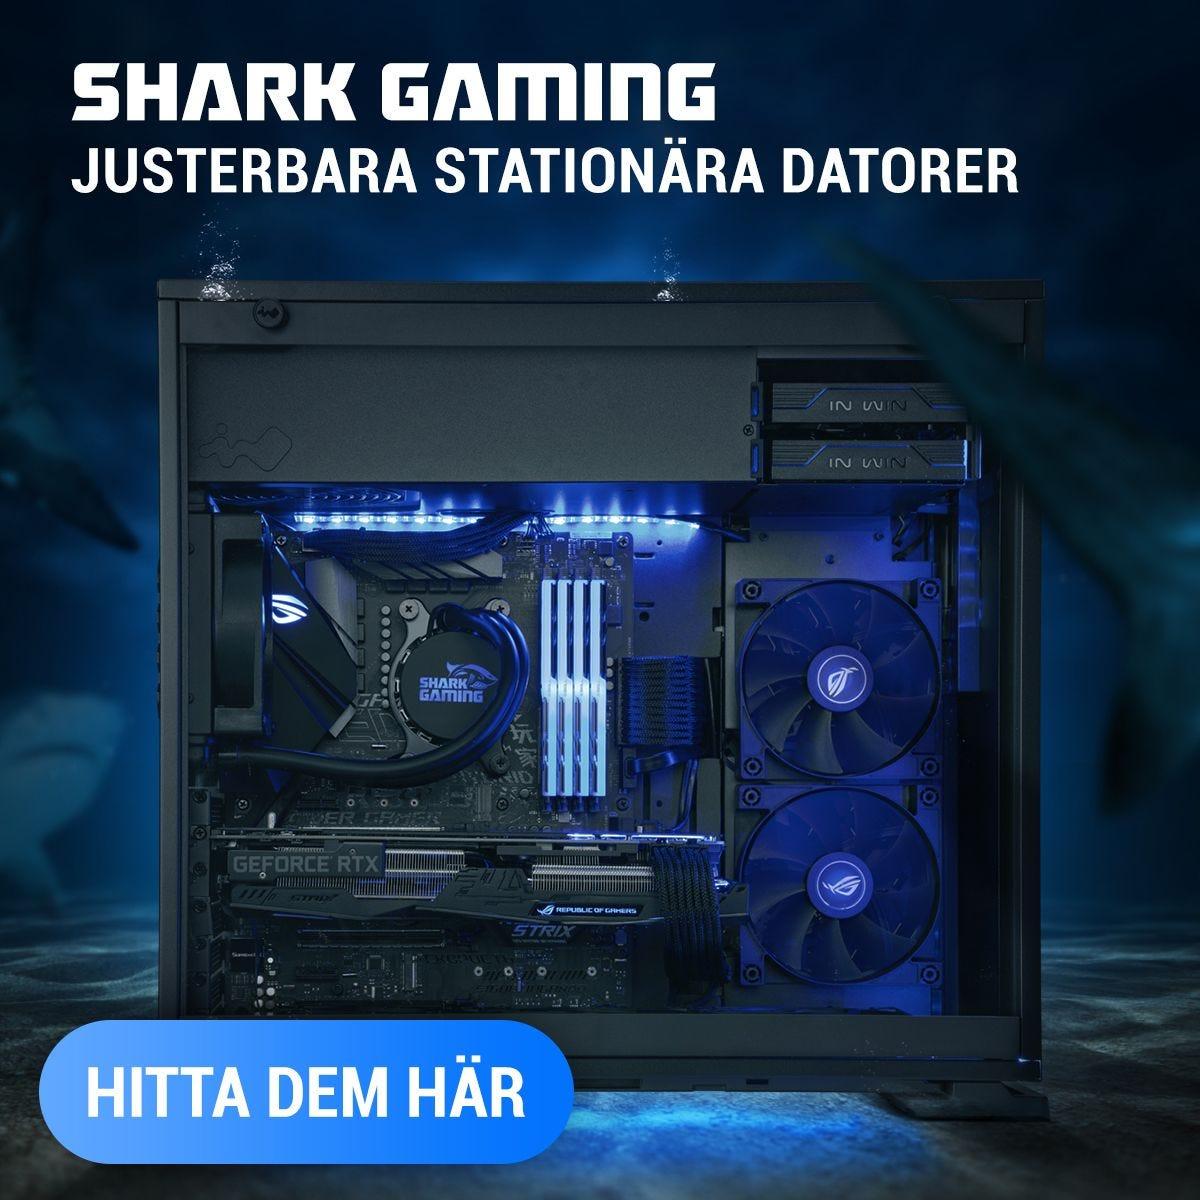 Shark Gaming Stationära Datorer